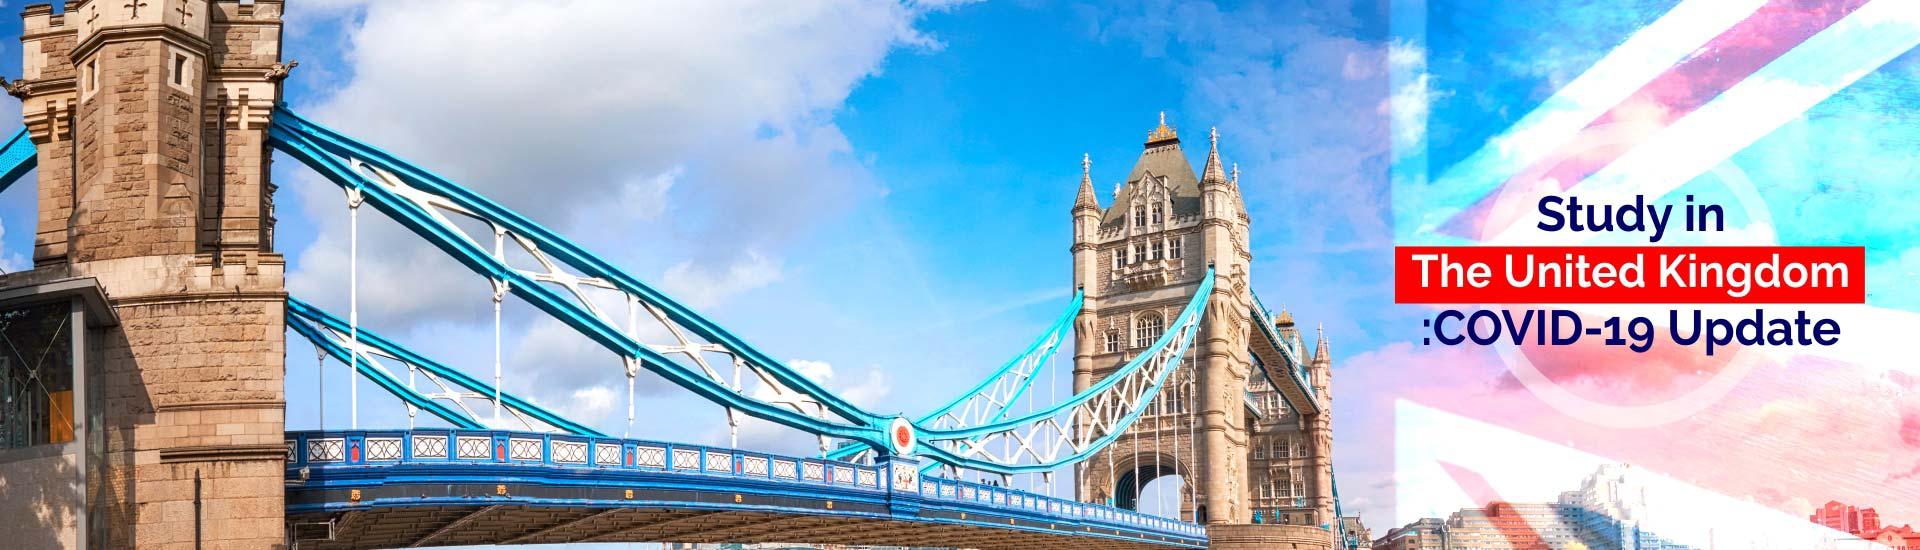 Study in the United Kingdom: COVID-19 Update